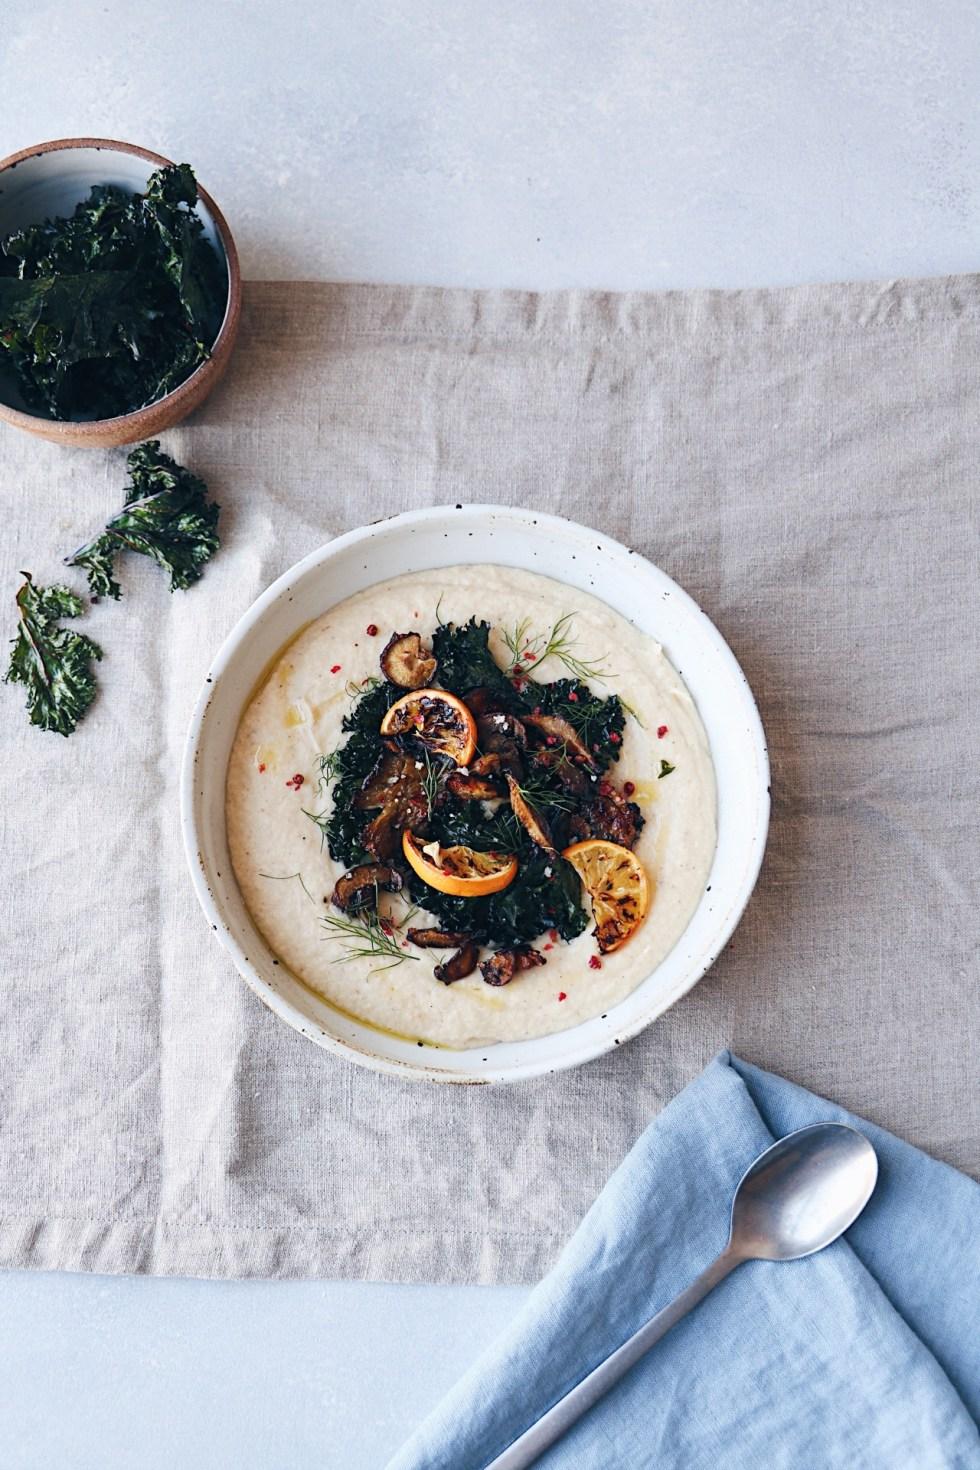 Creamy Roasted Cauliflower + Meyer Lemon Soup with Crispy Kale and Mushrooms - warmandrosy.com